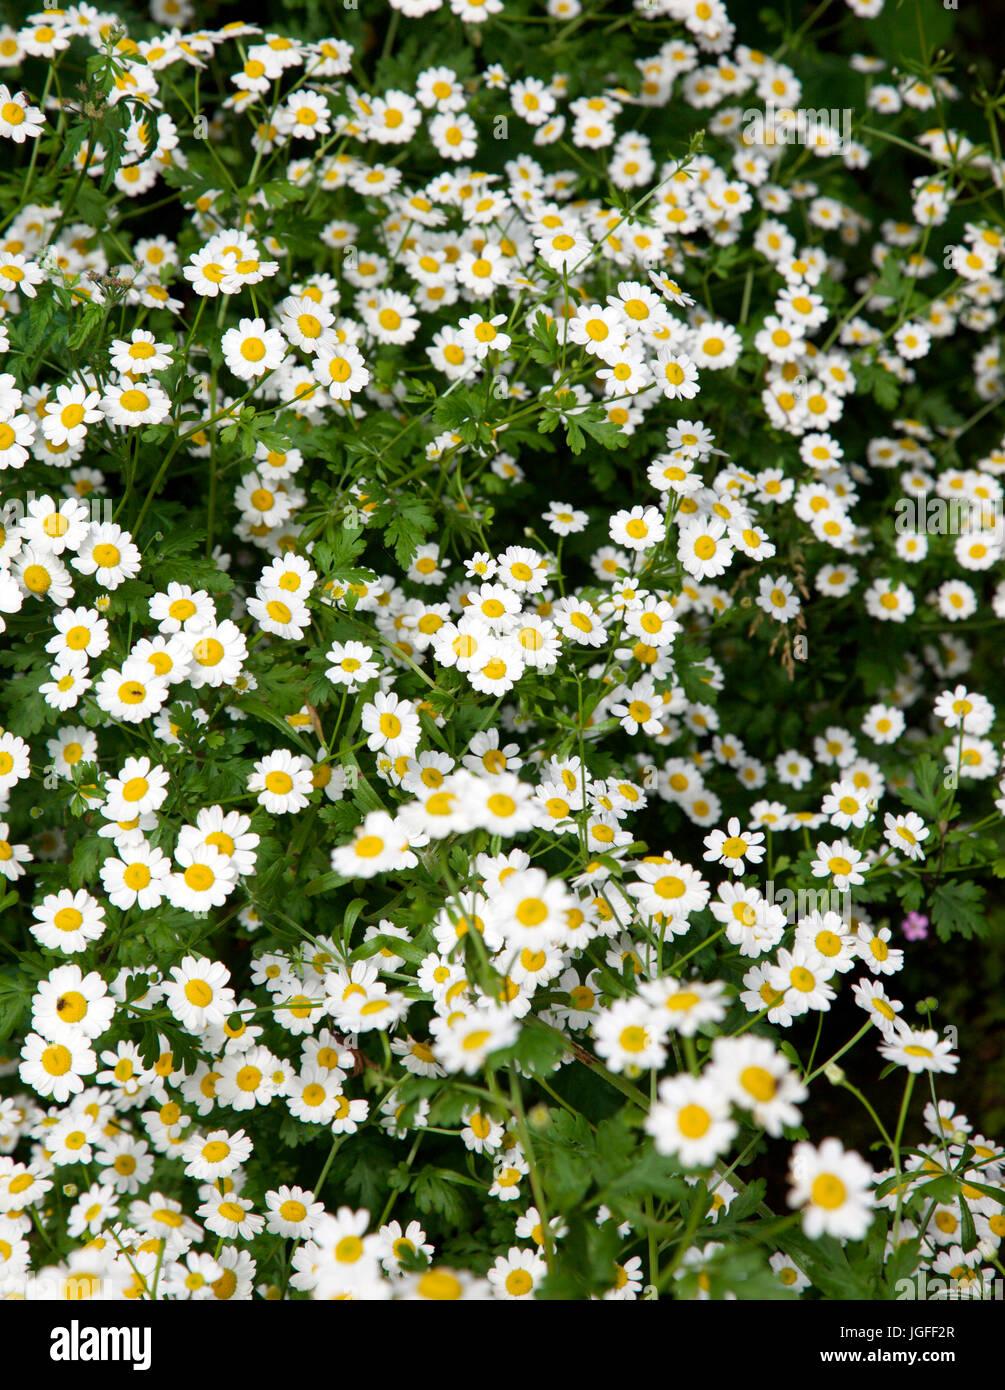 Feverfew, Tanacetum parthenium, wild flower growing in an Irish garden - Stock Image